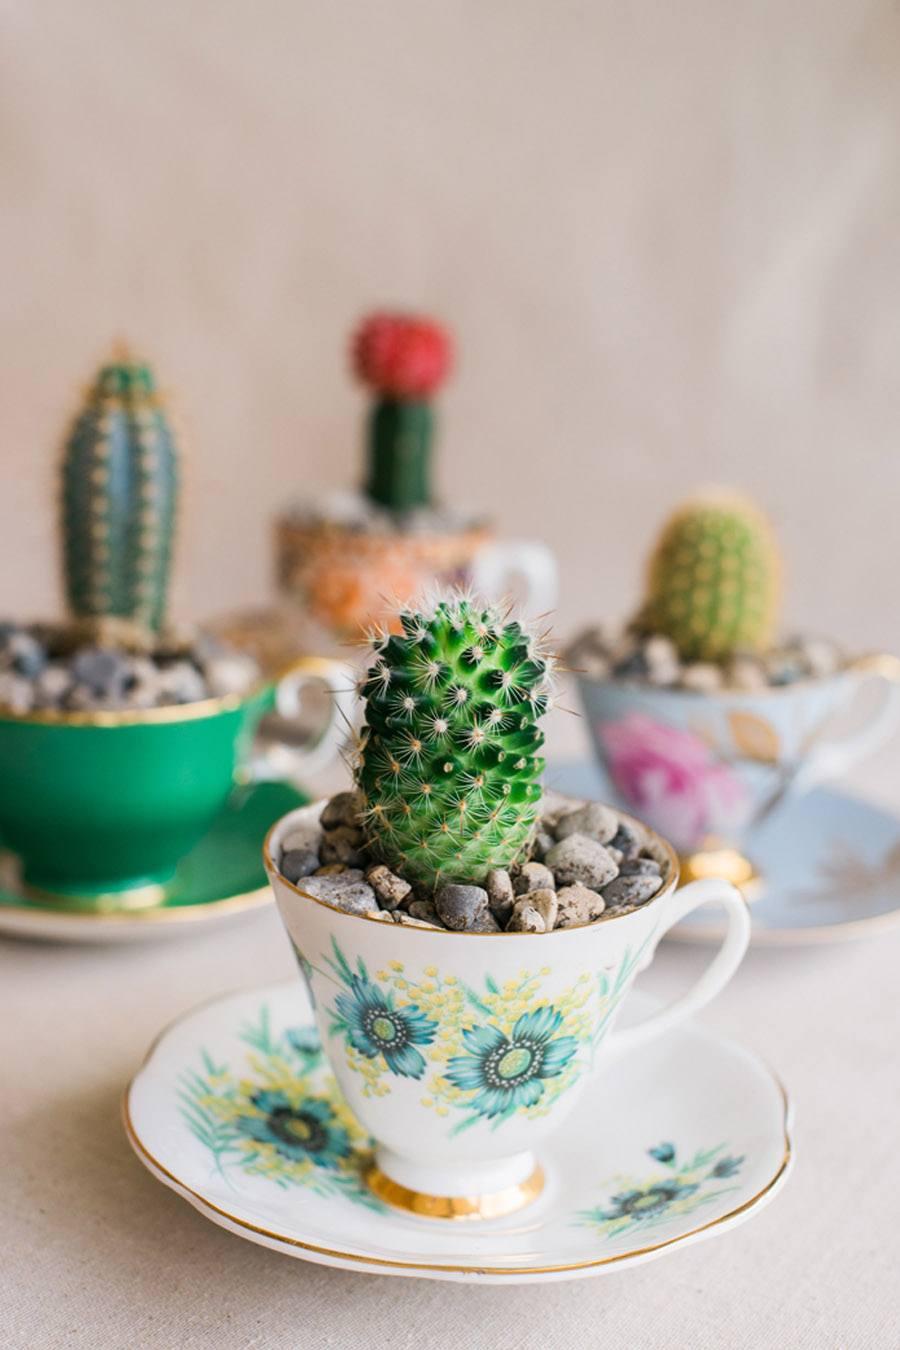 DIY MINI CACTUS EN TAZAS DE TÉ diy-boda-cactus